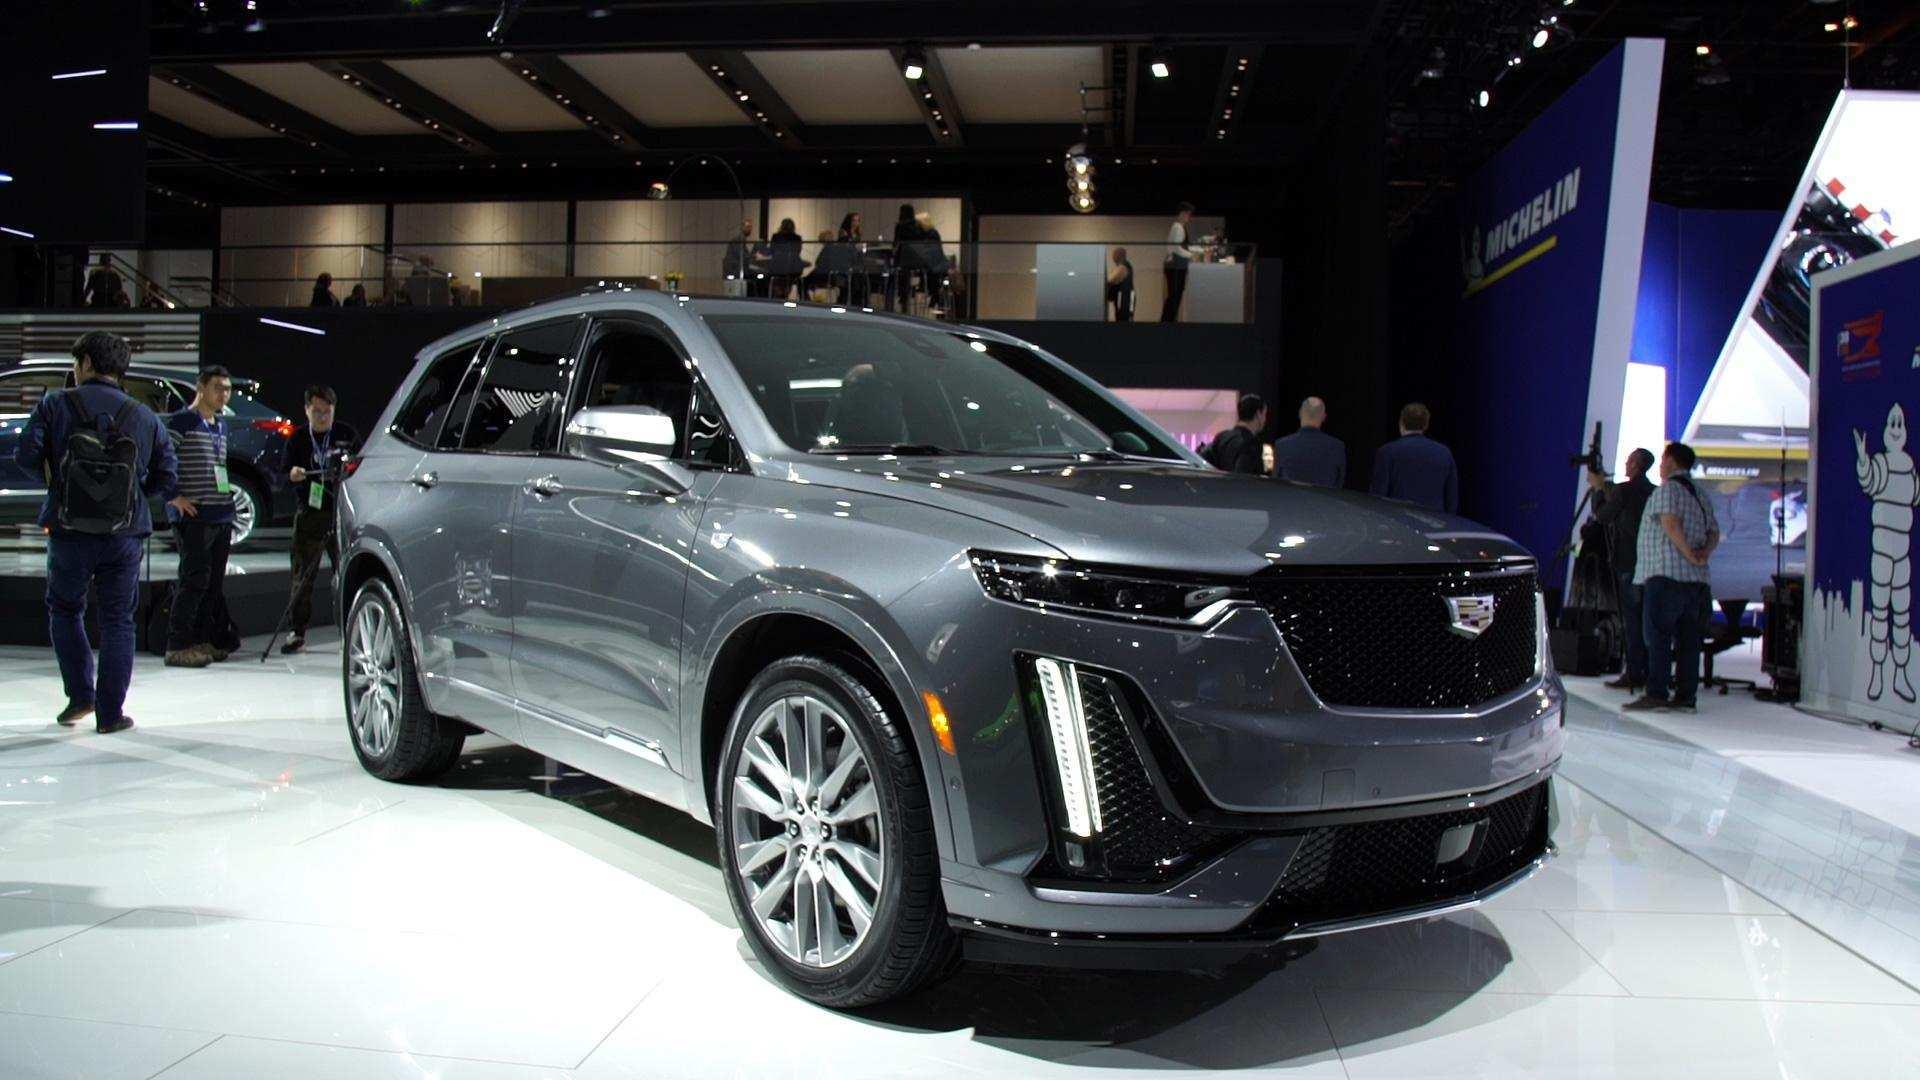 59 Concept of 2020 Cadillac Xt6 Availability Exterior with 2020 Cadillac Xt6 Availability